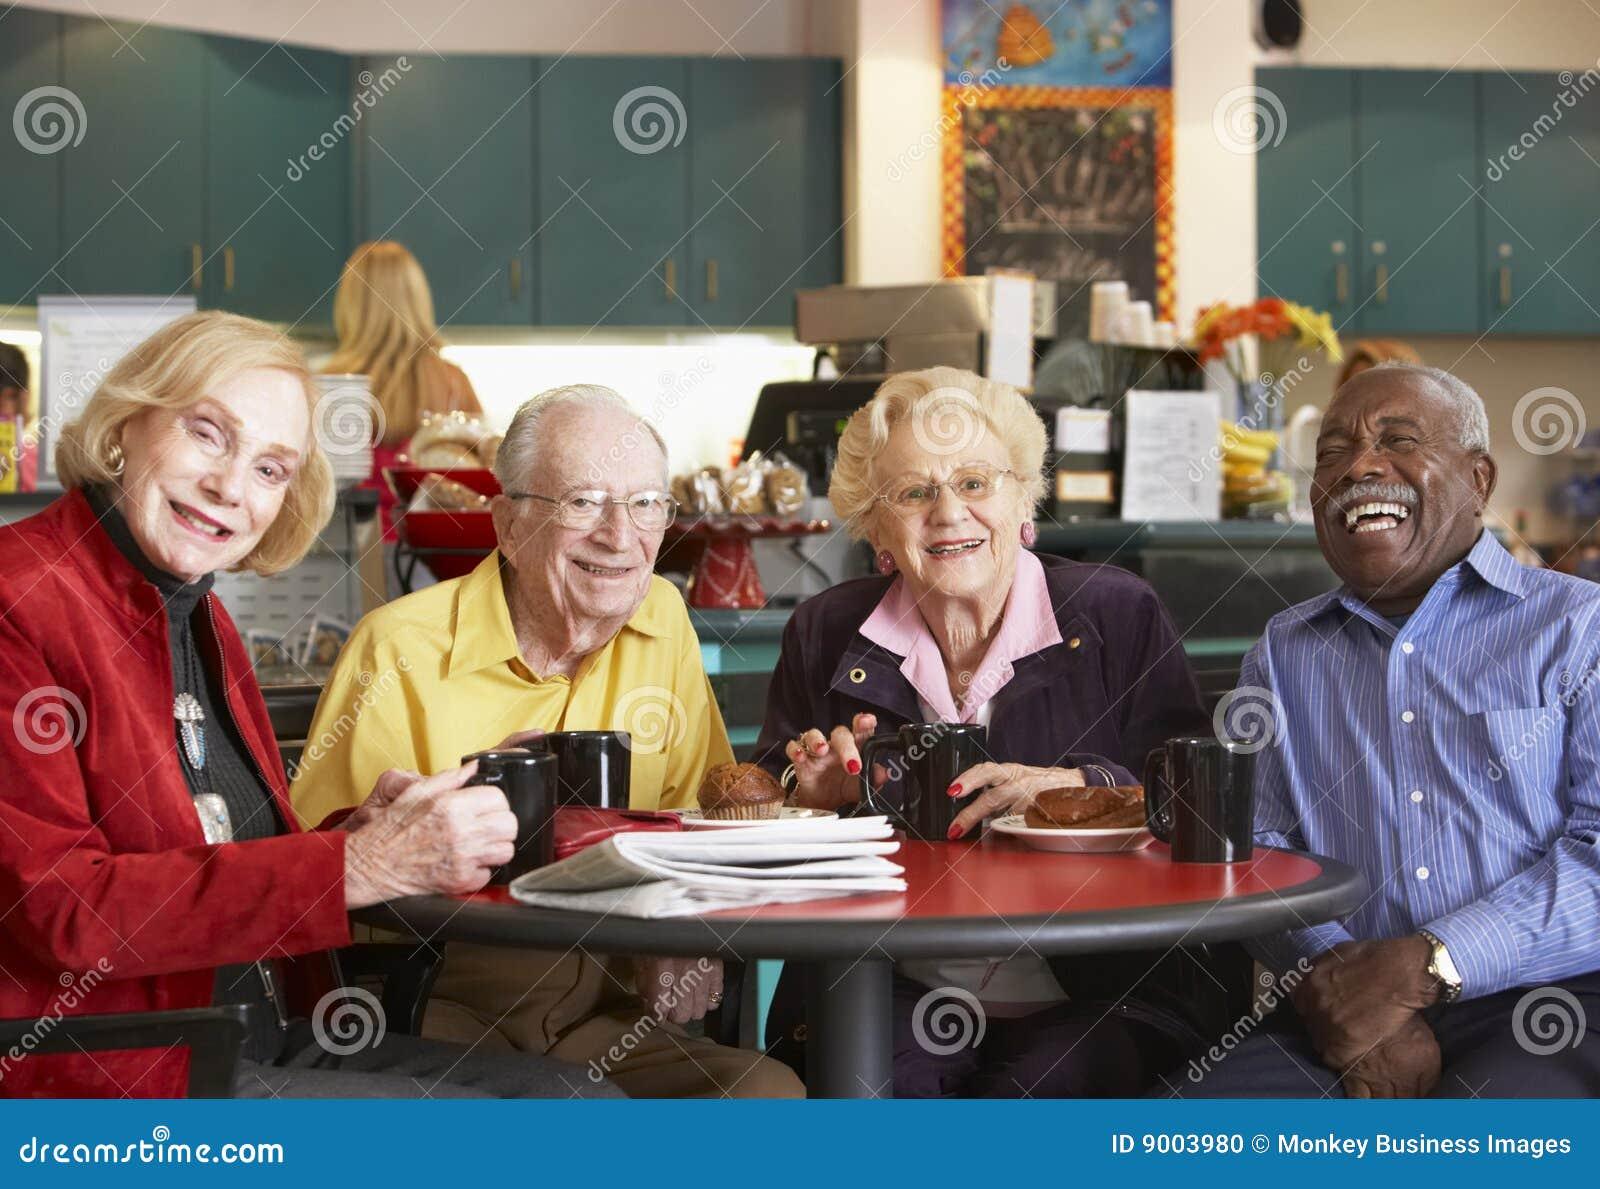 Senior adults having morning tea together